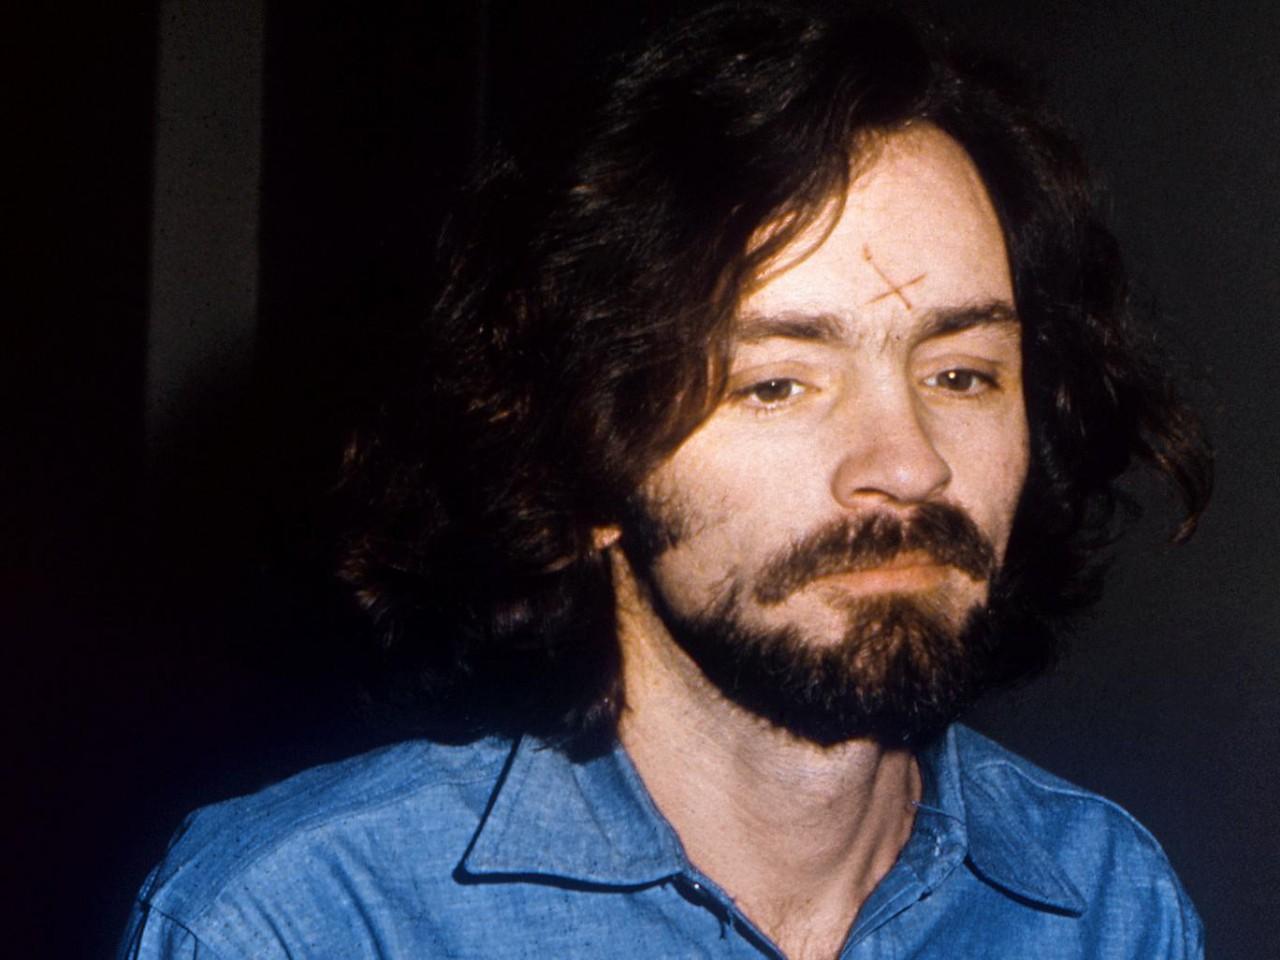 Чарльз Мэнсон все: умер главный убийца США